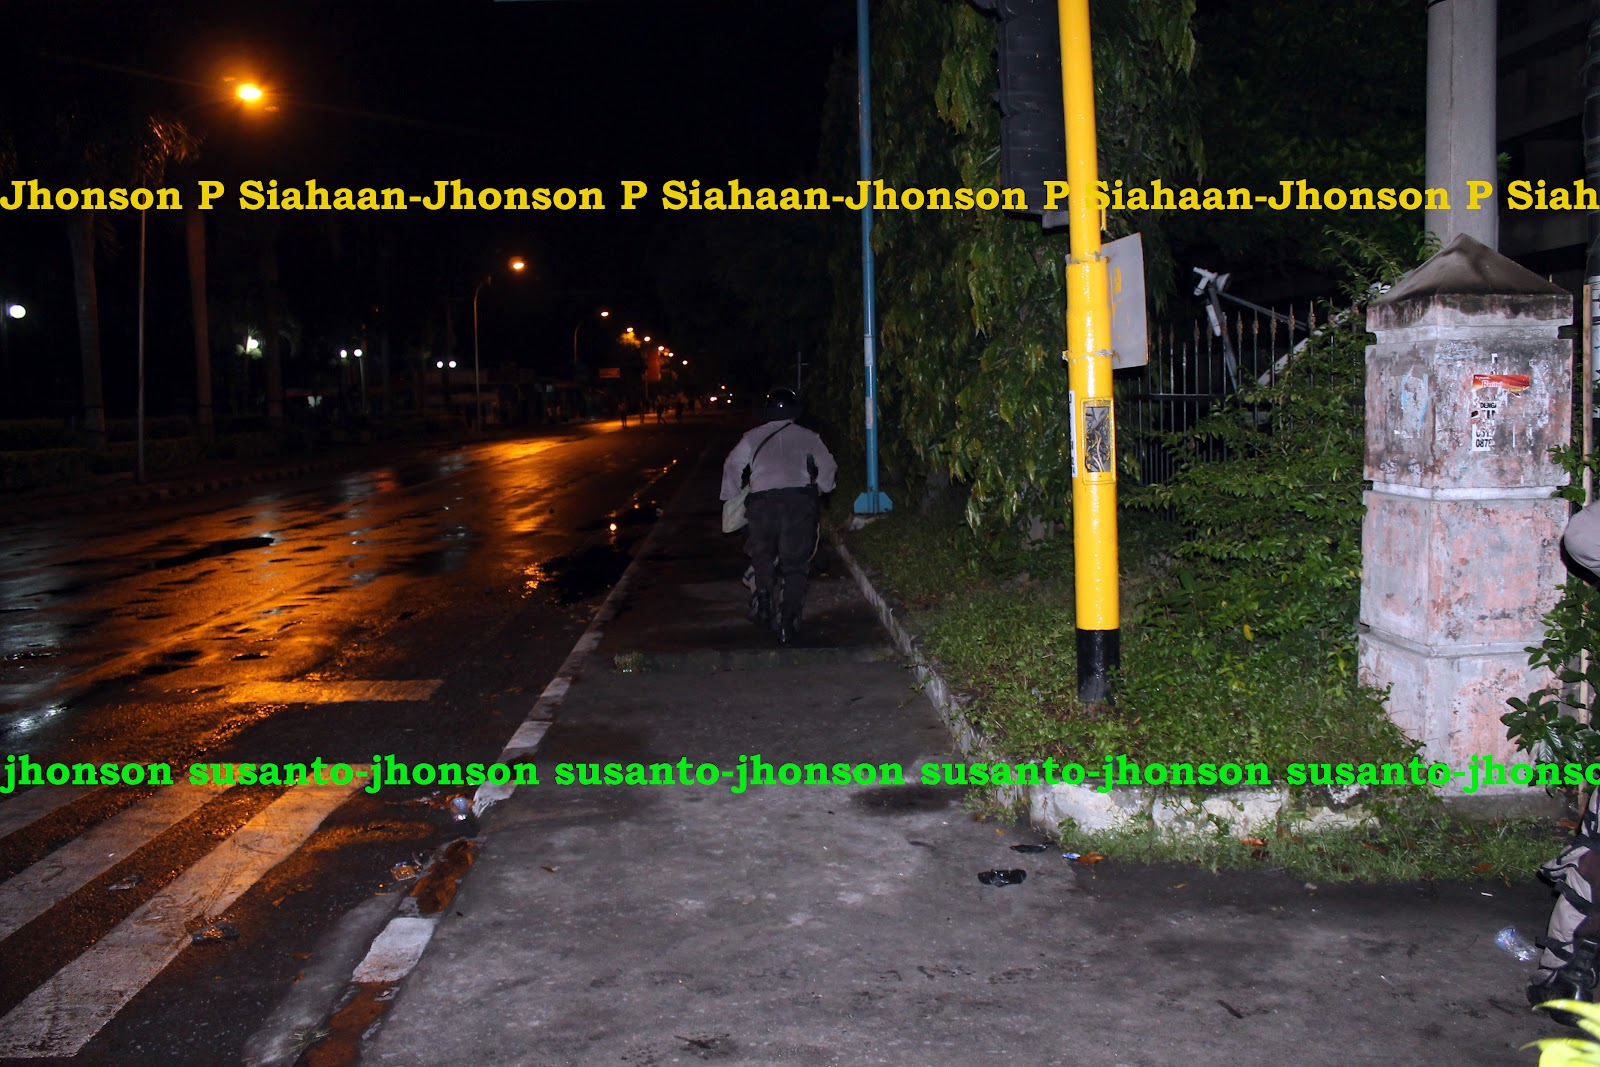 Kfc Sutomo Medan Sutomo Medan Jumat 30/3